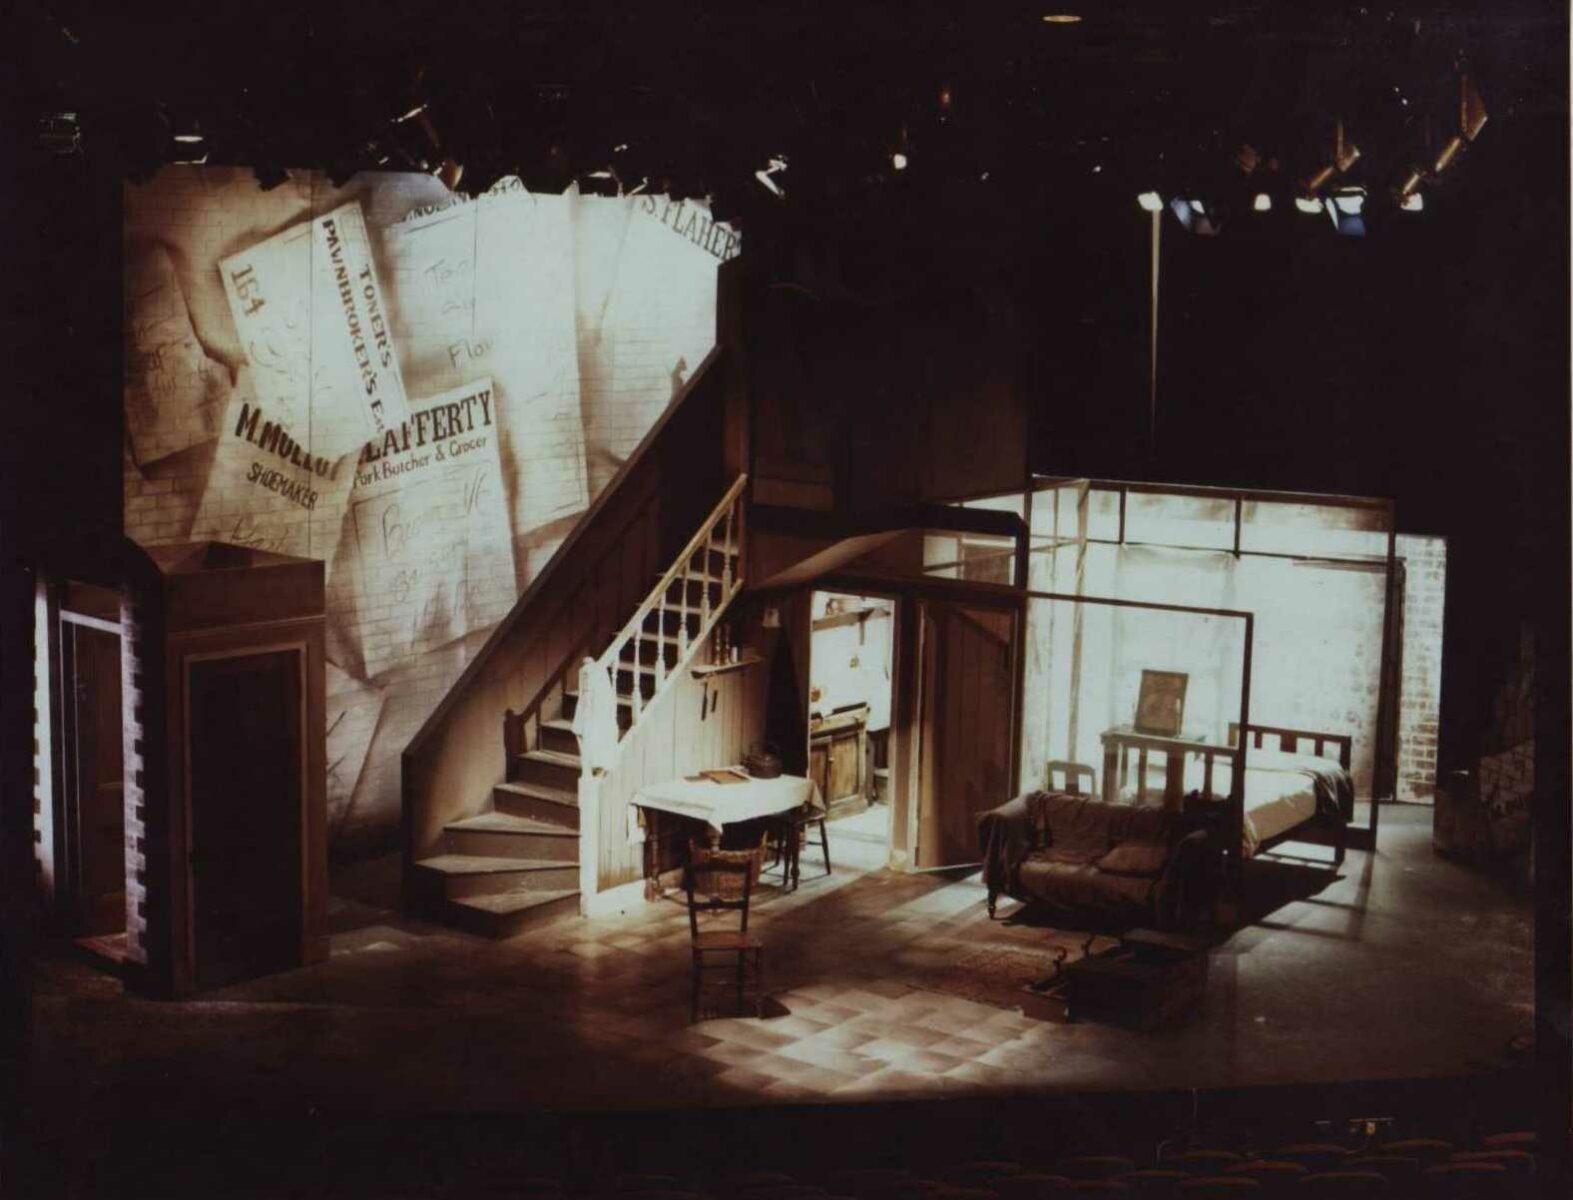 Mrs McConachy's Money, Lyric Theatre, Belfast, directed by Patrick Sandford